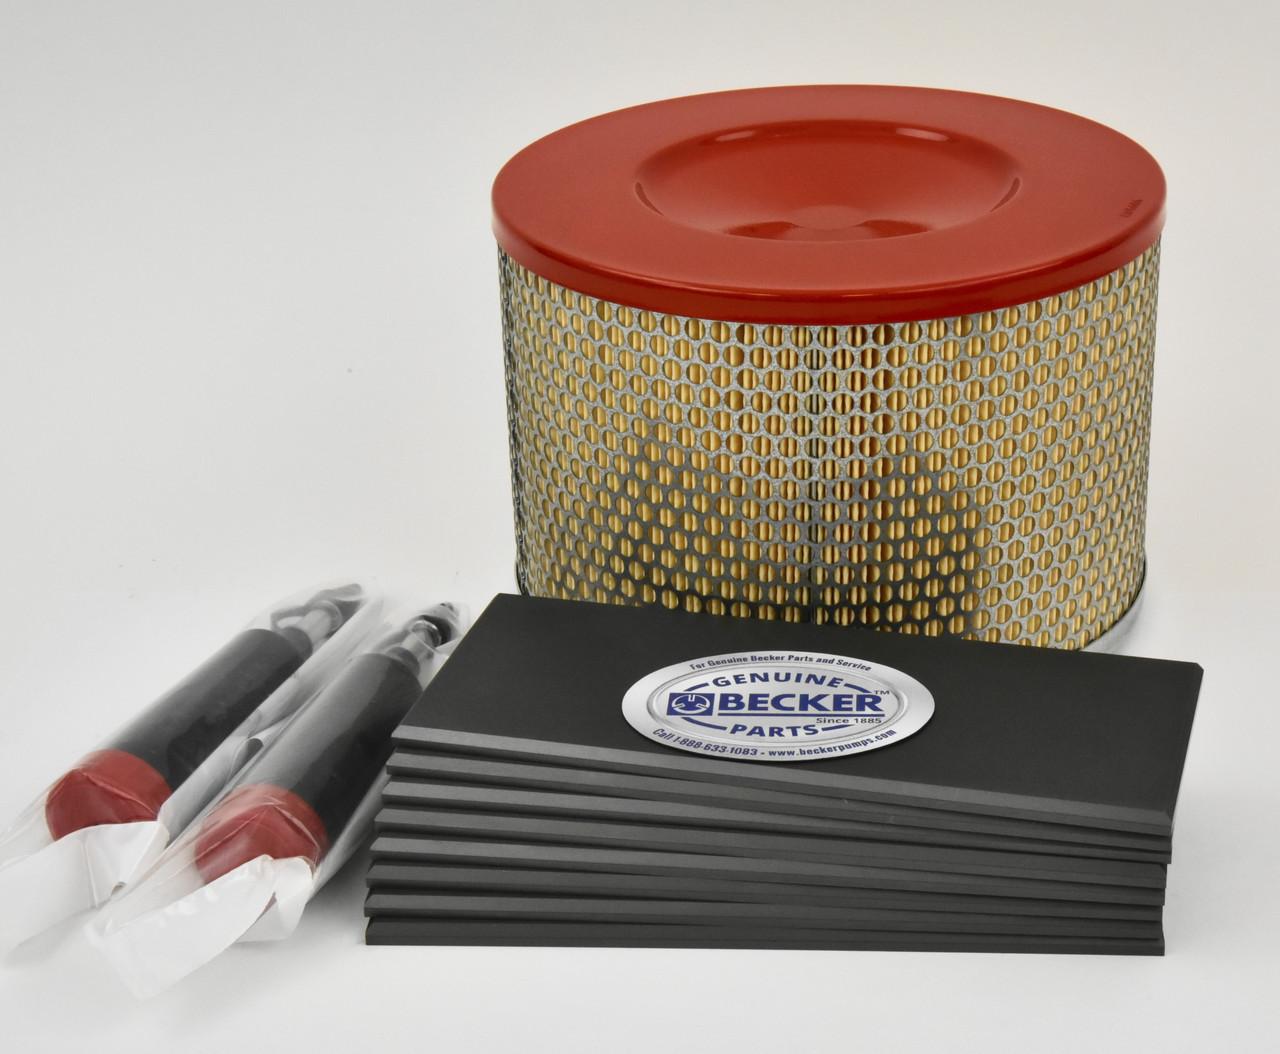 Becker Vacuum Pump Maintenance Kit VTLF 2.400 & 2.500